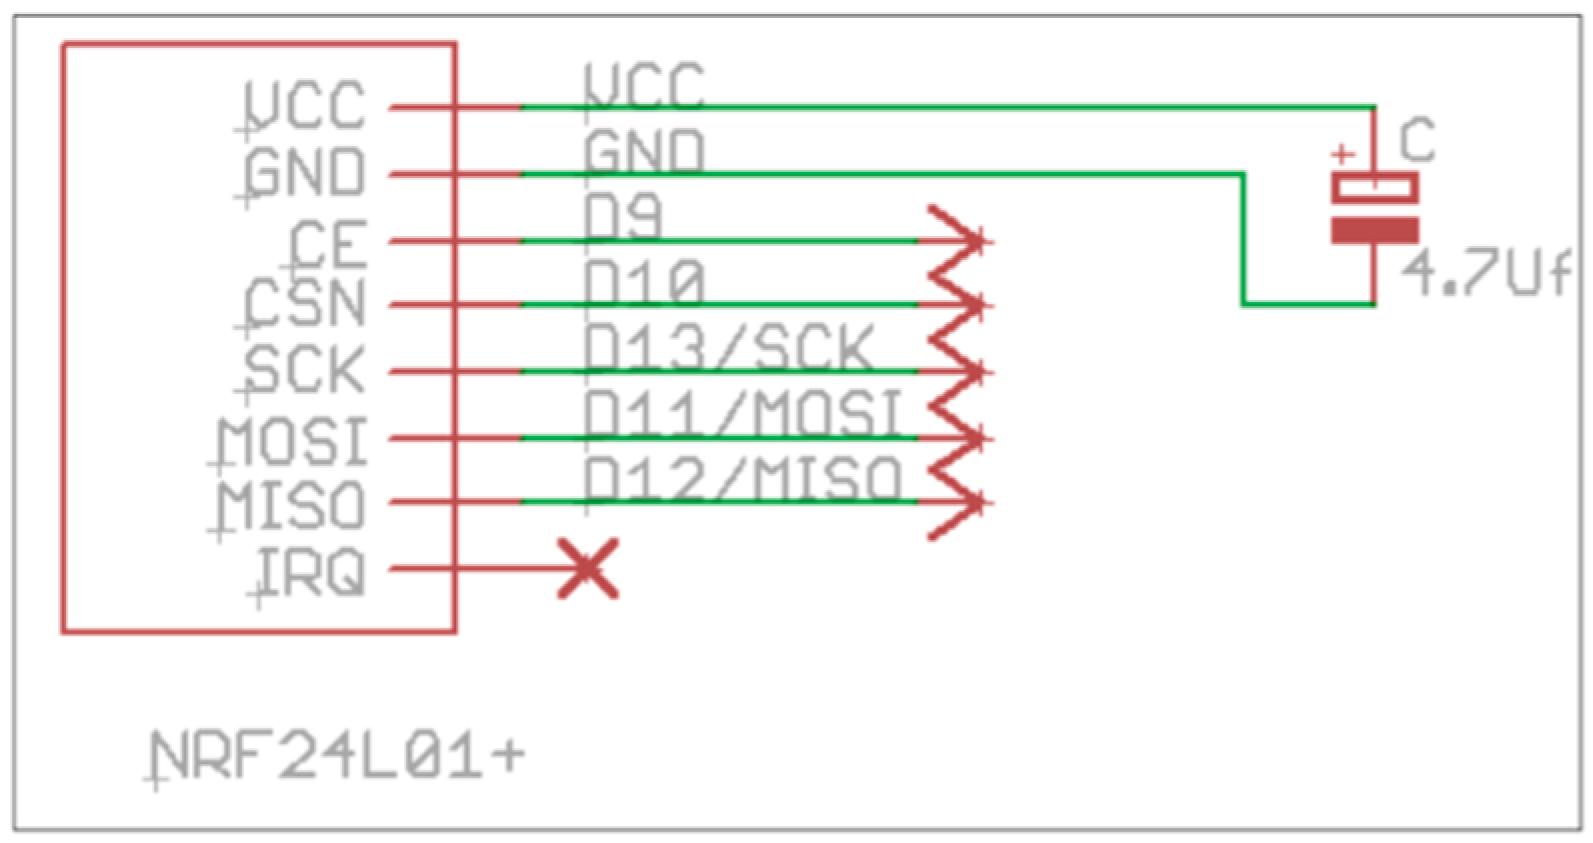 Sensors Free Full Text Smart Toys Designed For Detecting Ace Security Motion Sensor Light Wiring Diagram 16 01953 G005